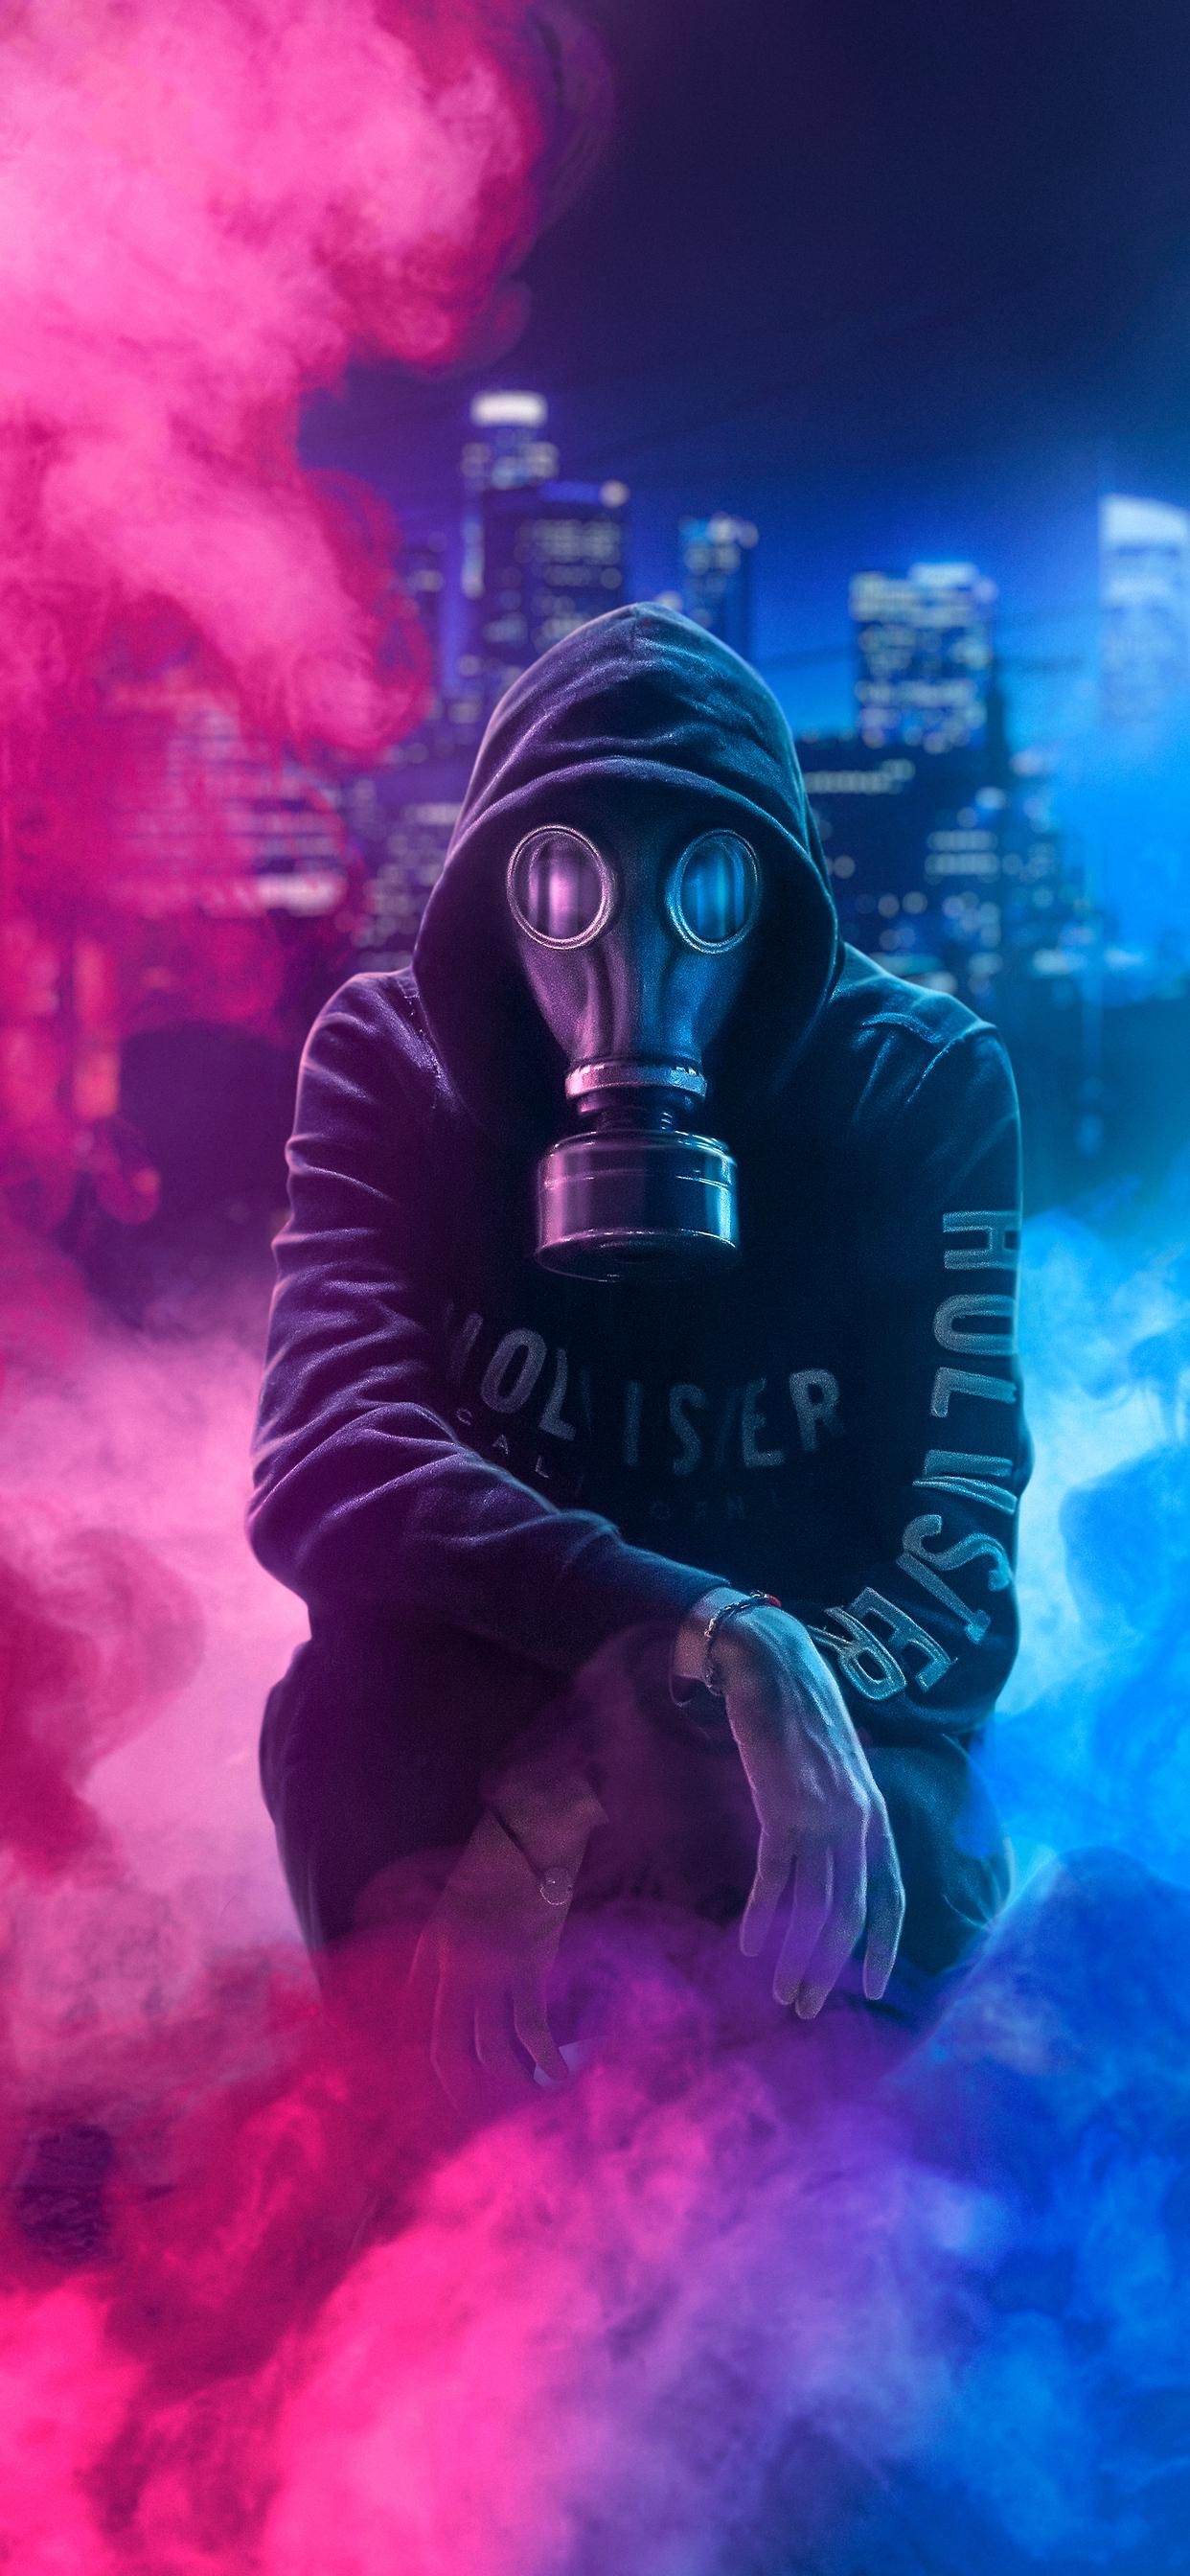 1242x2688 Hoodie Guy Mask Man 4k Iphone Xs Max Hd 4k